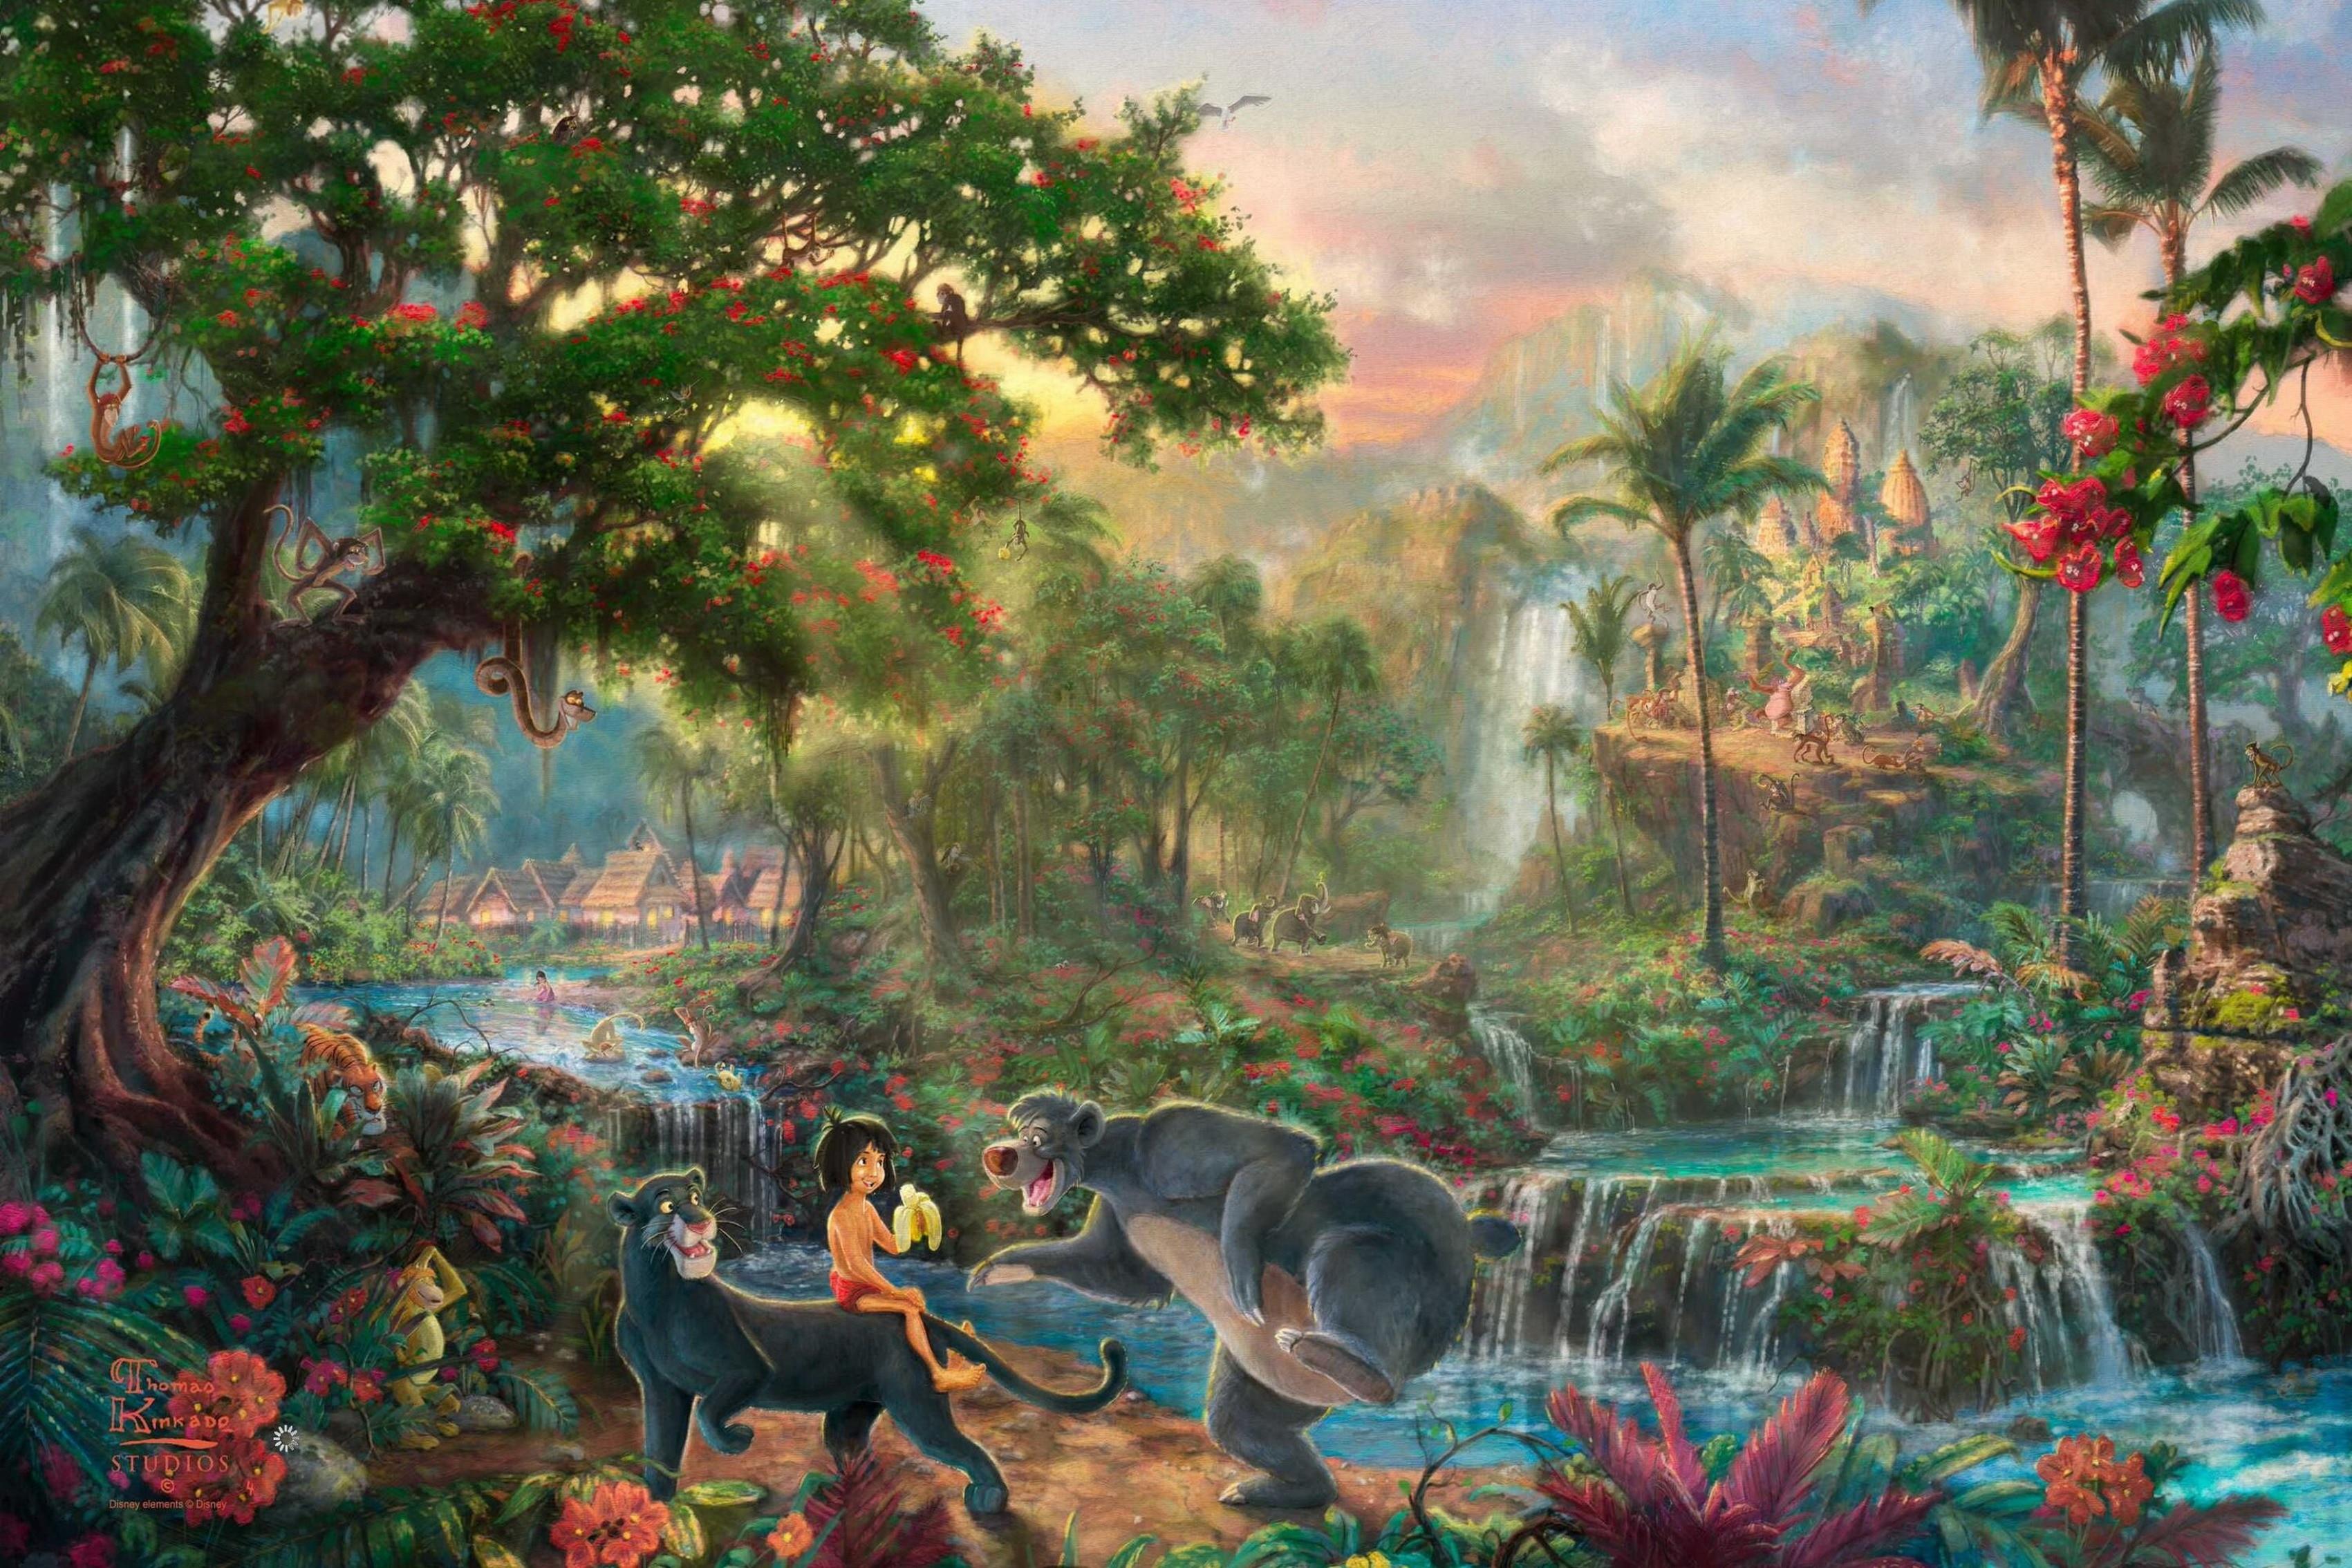 Jungle Decoration Online Get Cheap Jungle Poster Aliexpresscom Alibaba Group